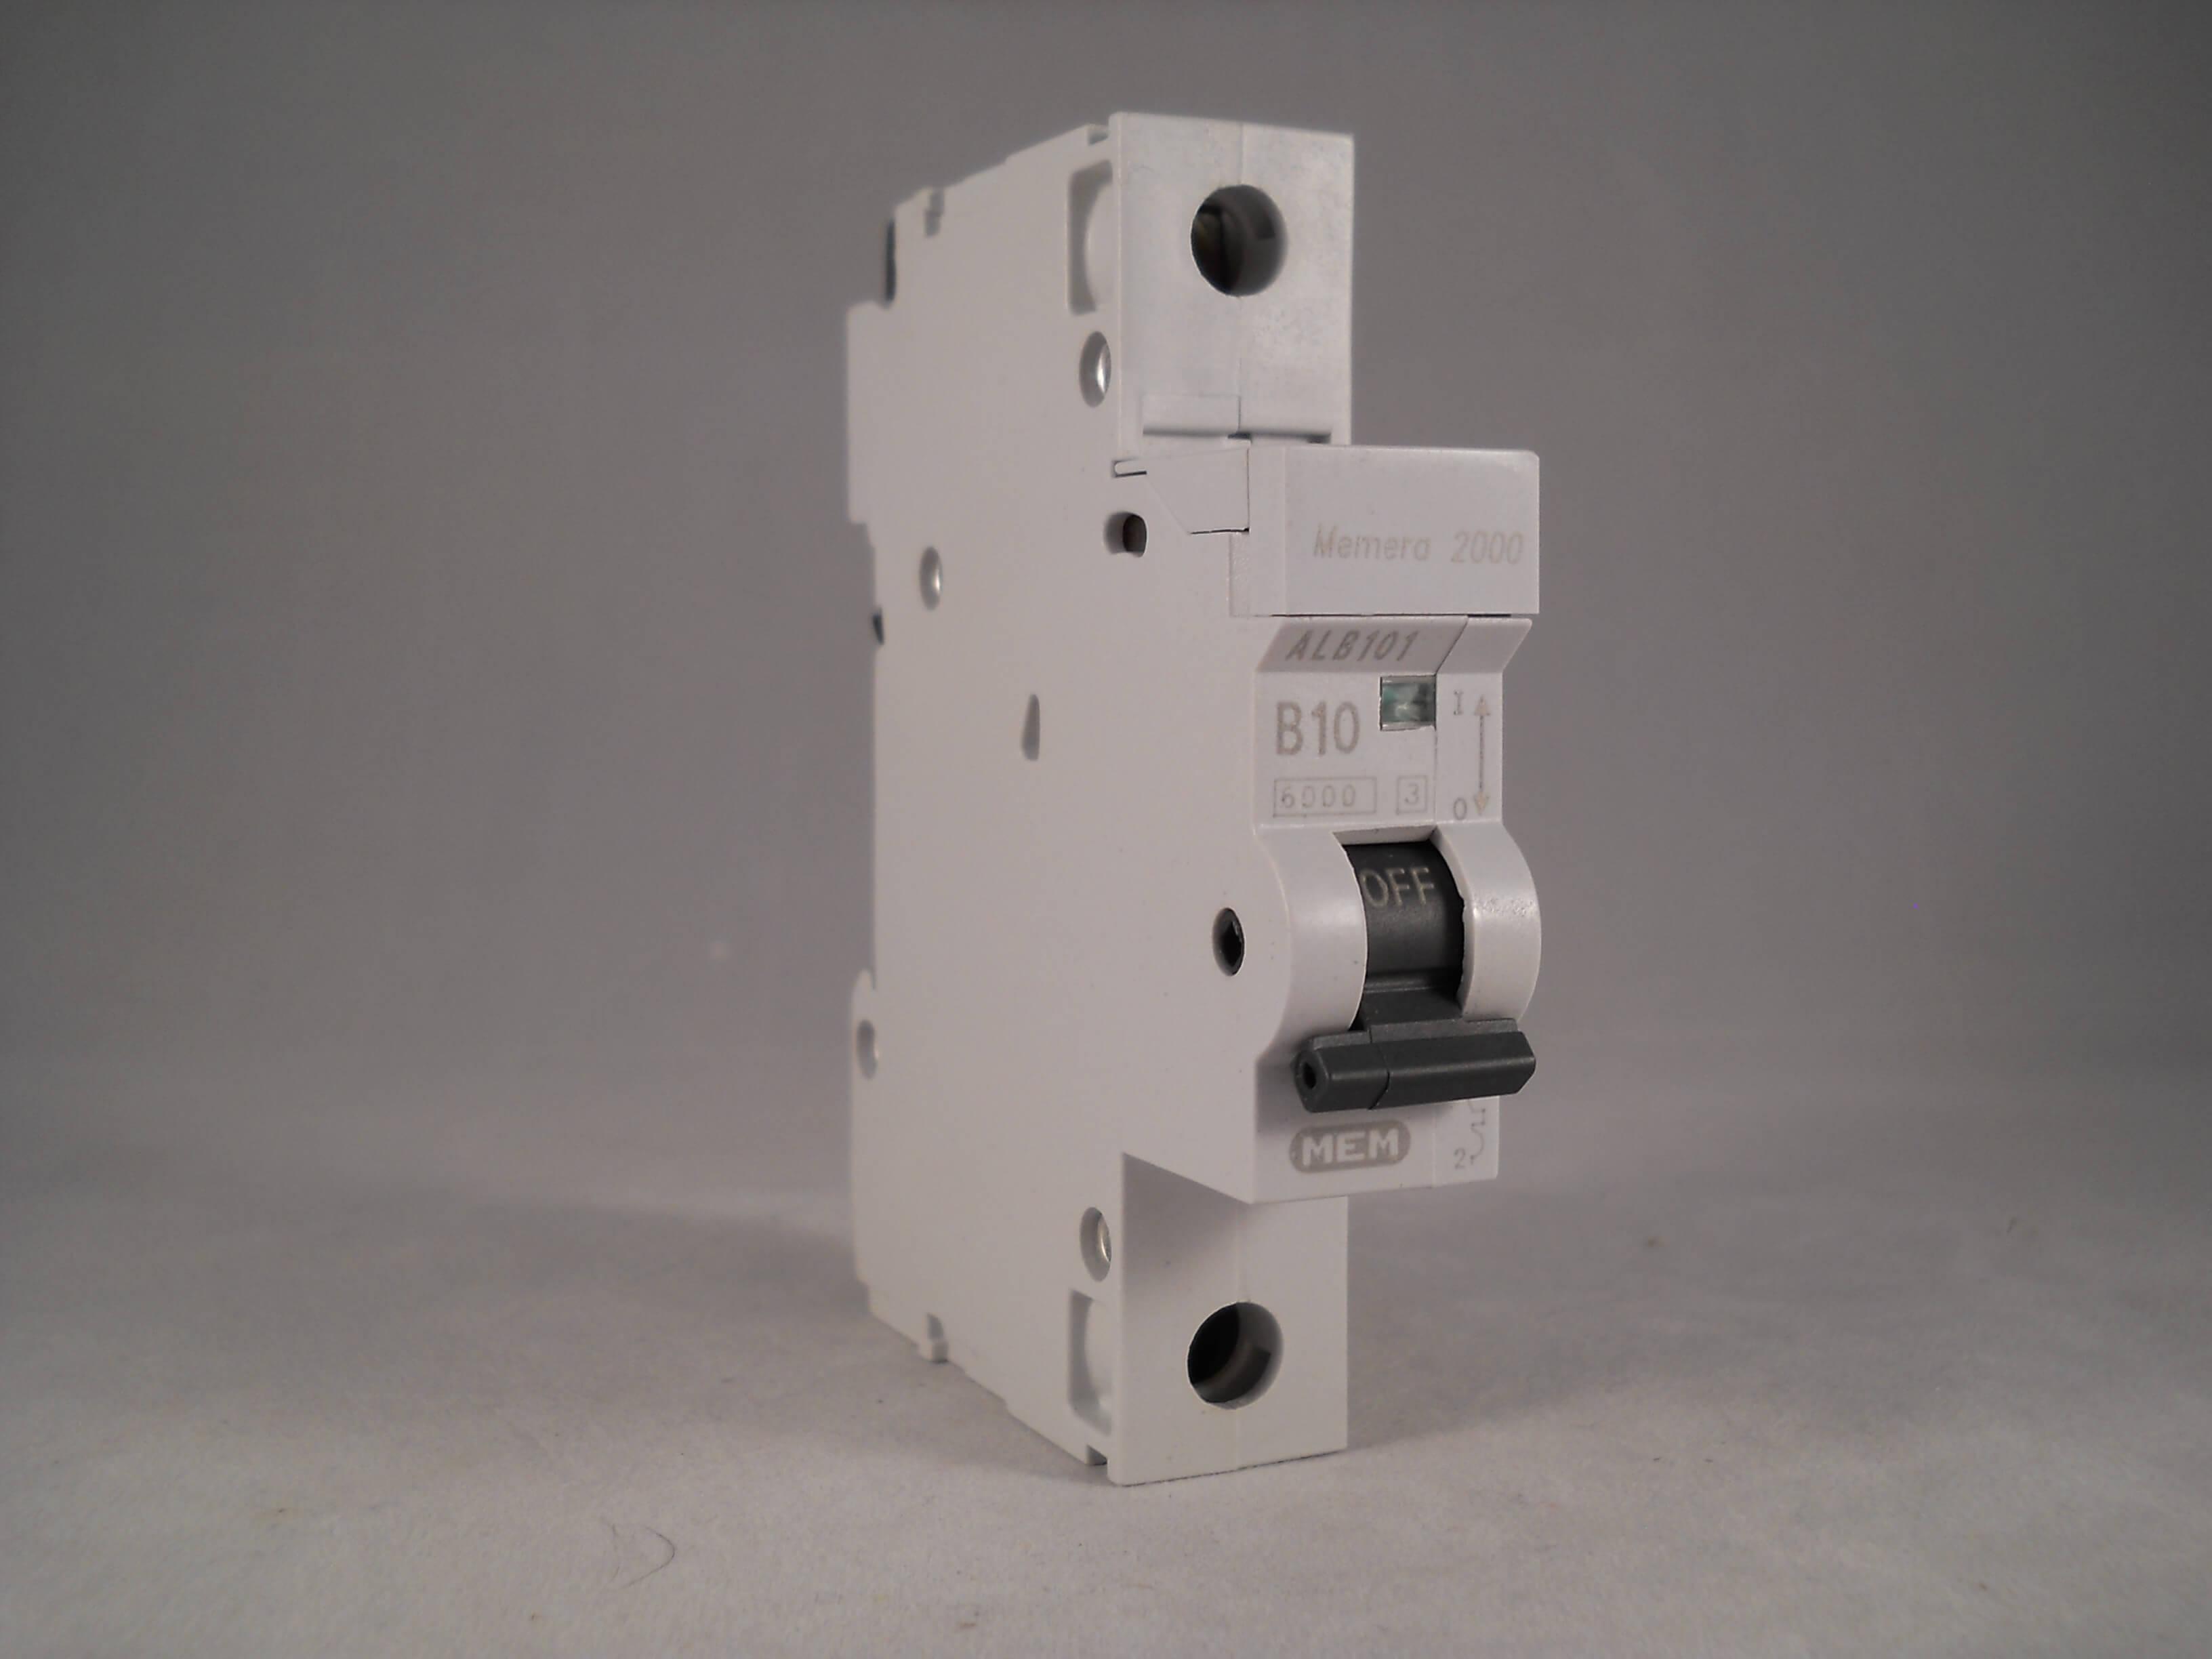 MEM Memera 2000 ALB101-10a Type B Single Pole MCB Used